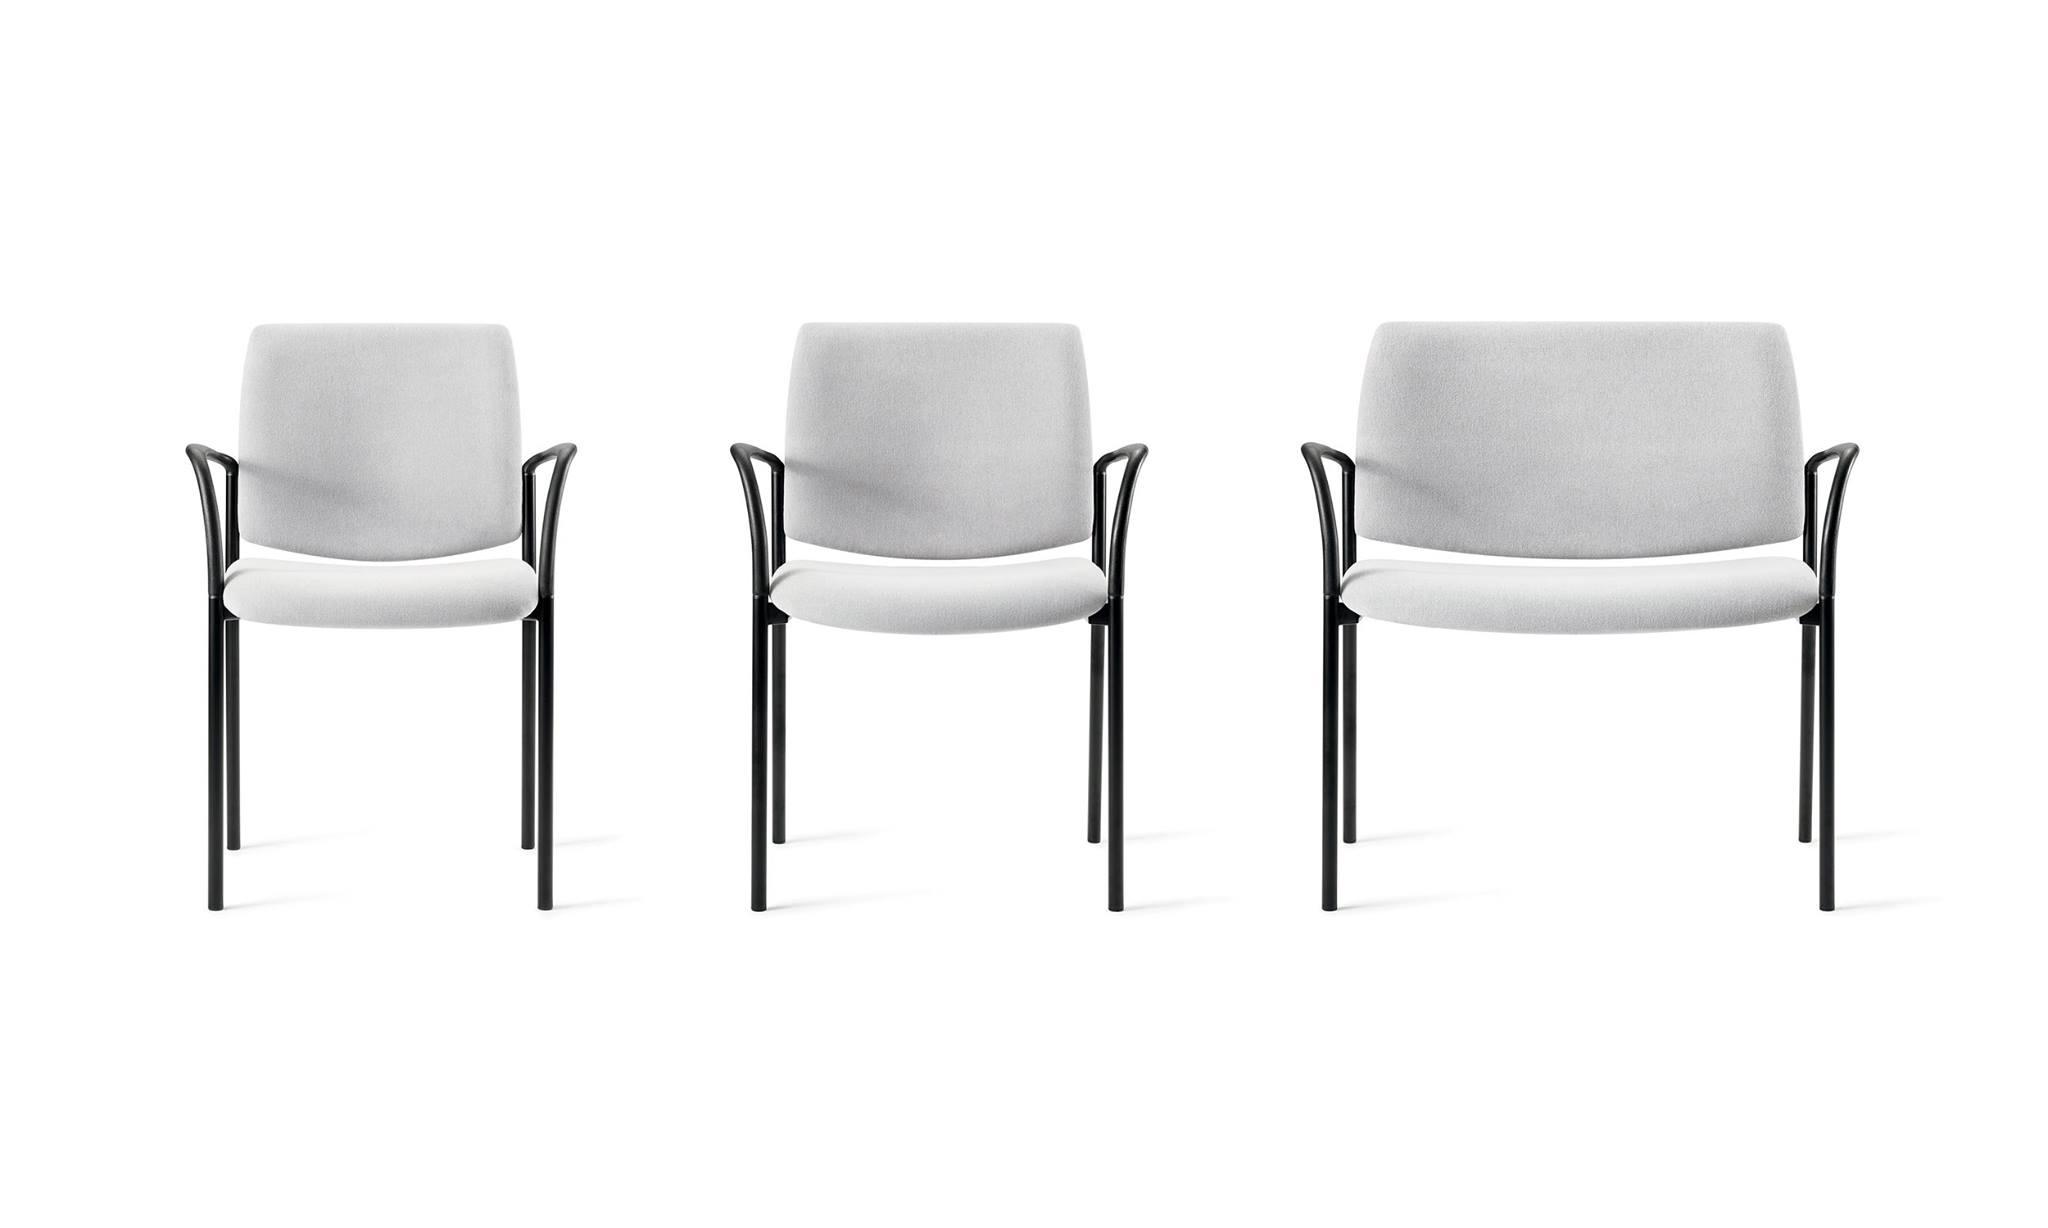 kezu source bariatric seating healthcare furniture